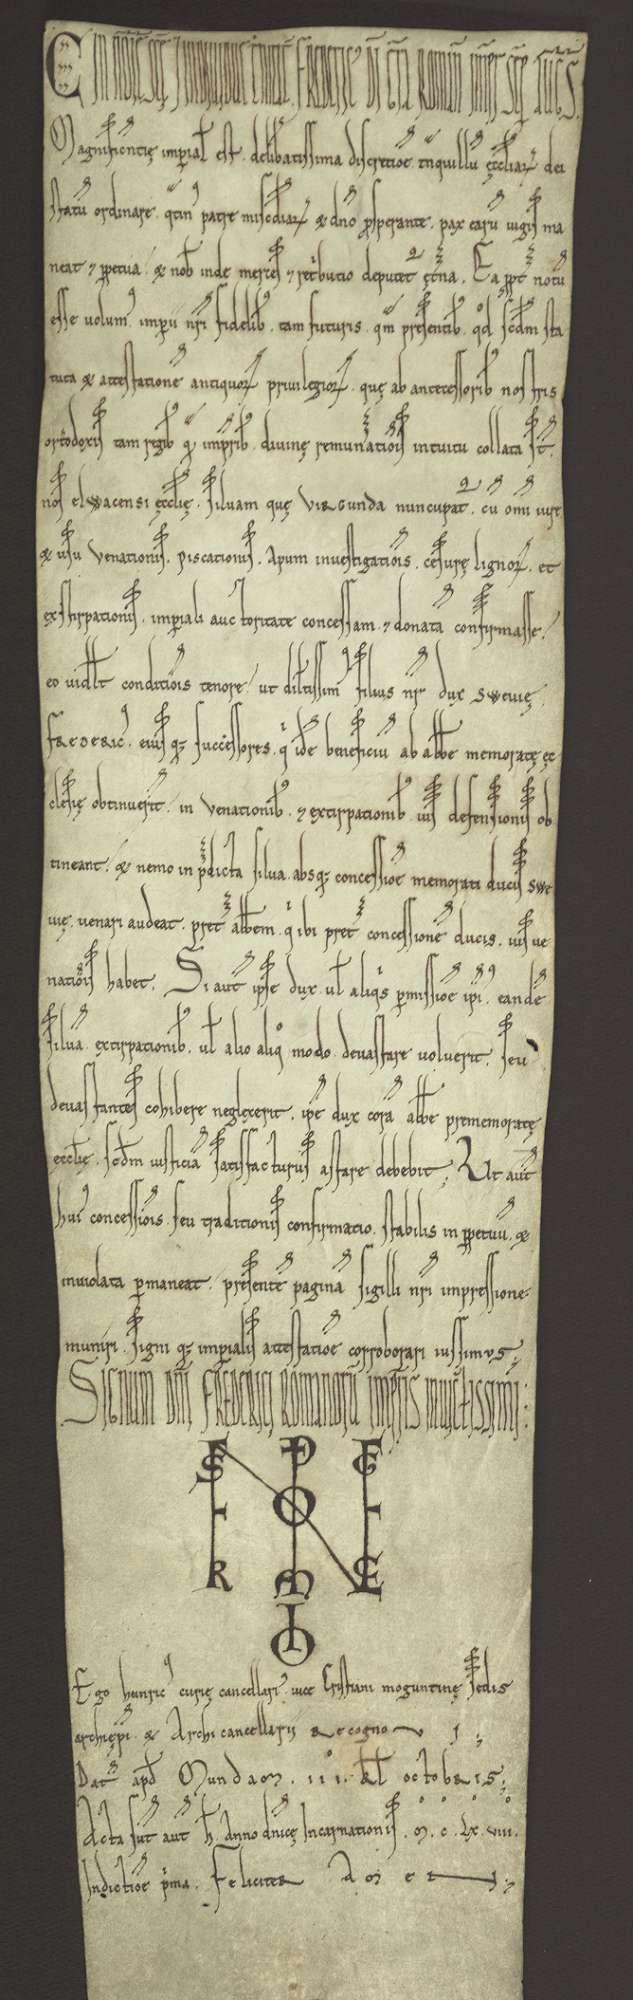 Kaiser Friedrich (I.) bestätigt der Kirche in Ellwangen ihre Rechte an dem Virgundawald unter ausgedrückten näheren Bestimmungen., Bild 1